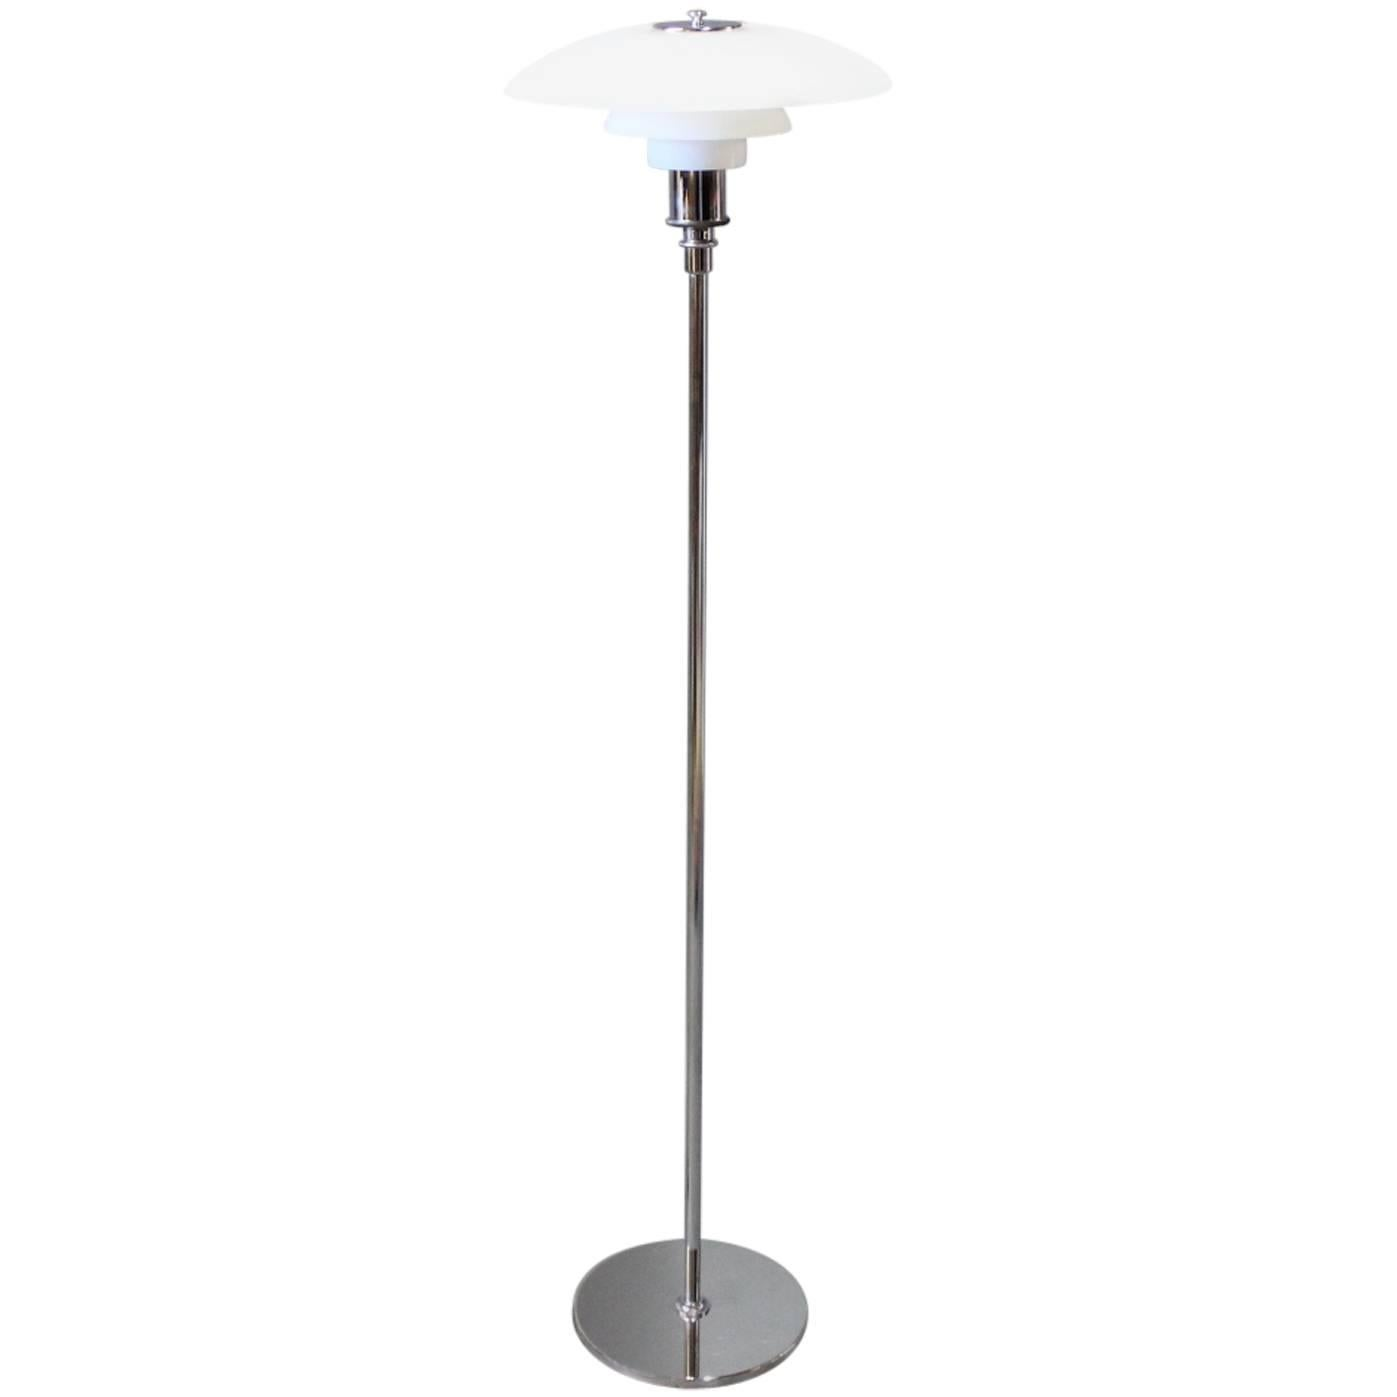 PH 3½/2½ Floor Lamp by Poul Henningsen and Louis Poulsen, 2002